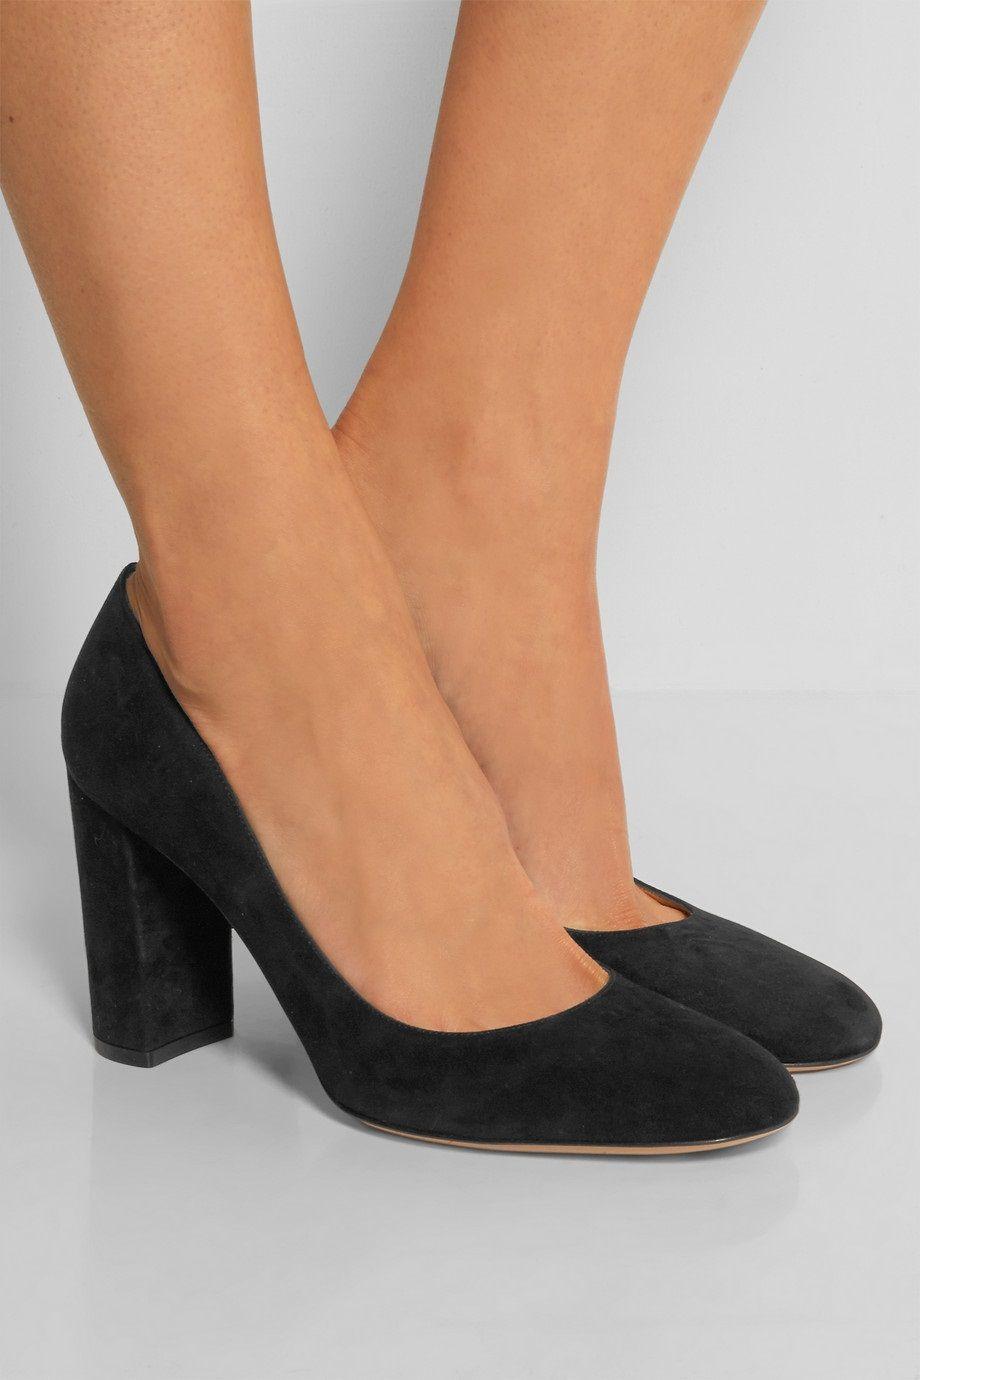 Zandina Ladies Handmade Fashion Thick Block Heel Closed Toe High Heel Party Office Pumps Shoes BLack SL